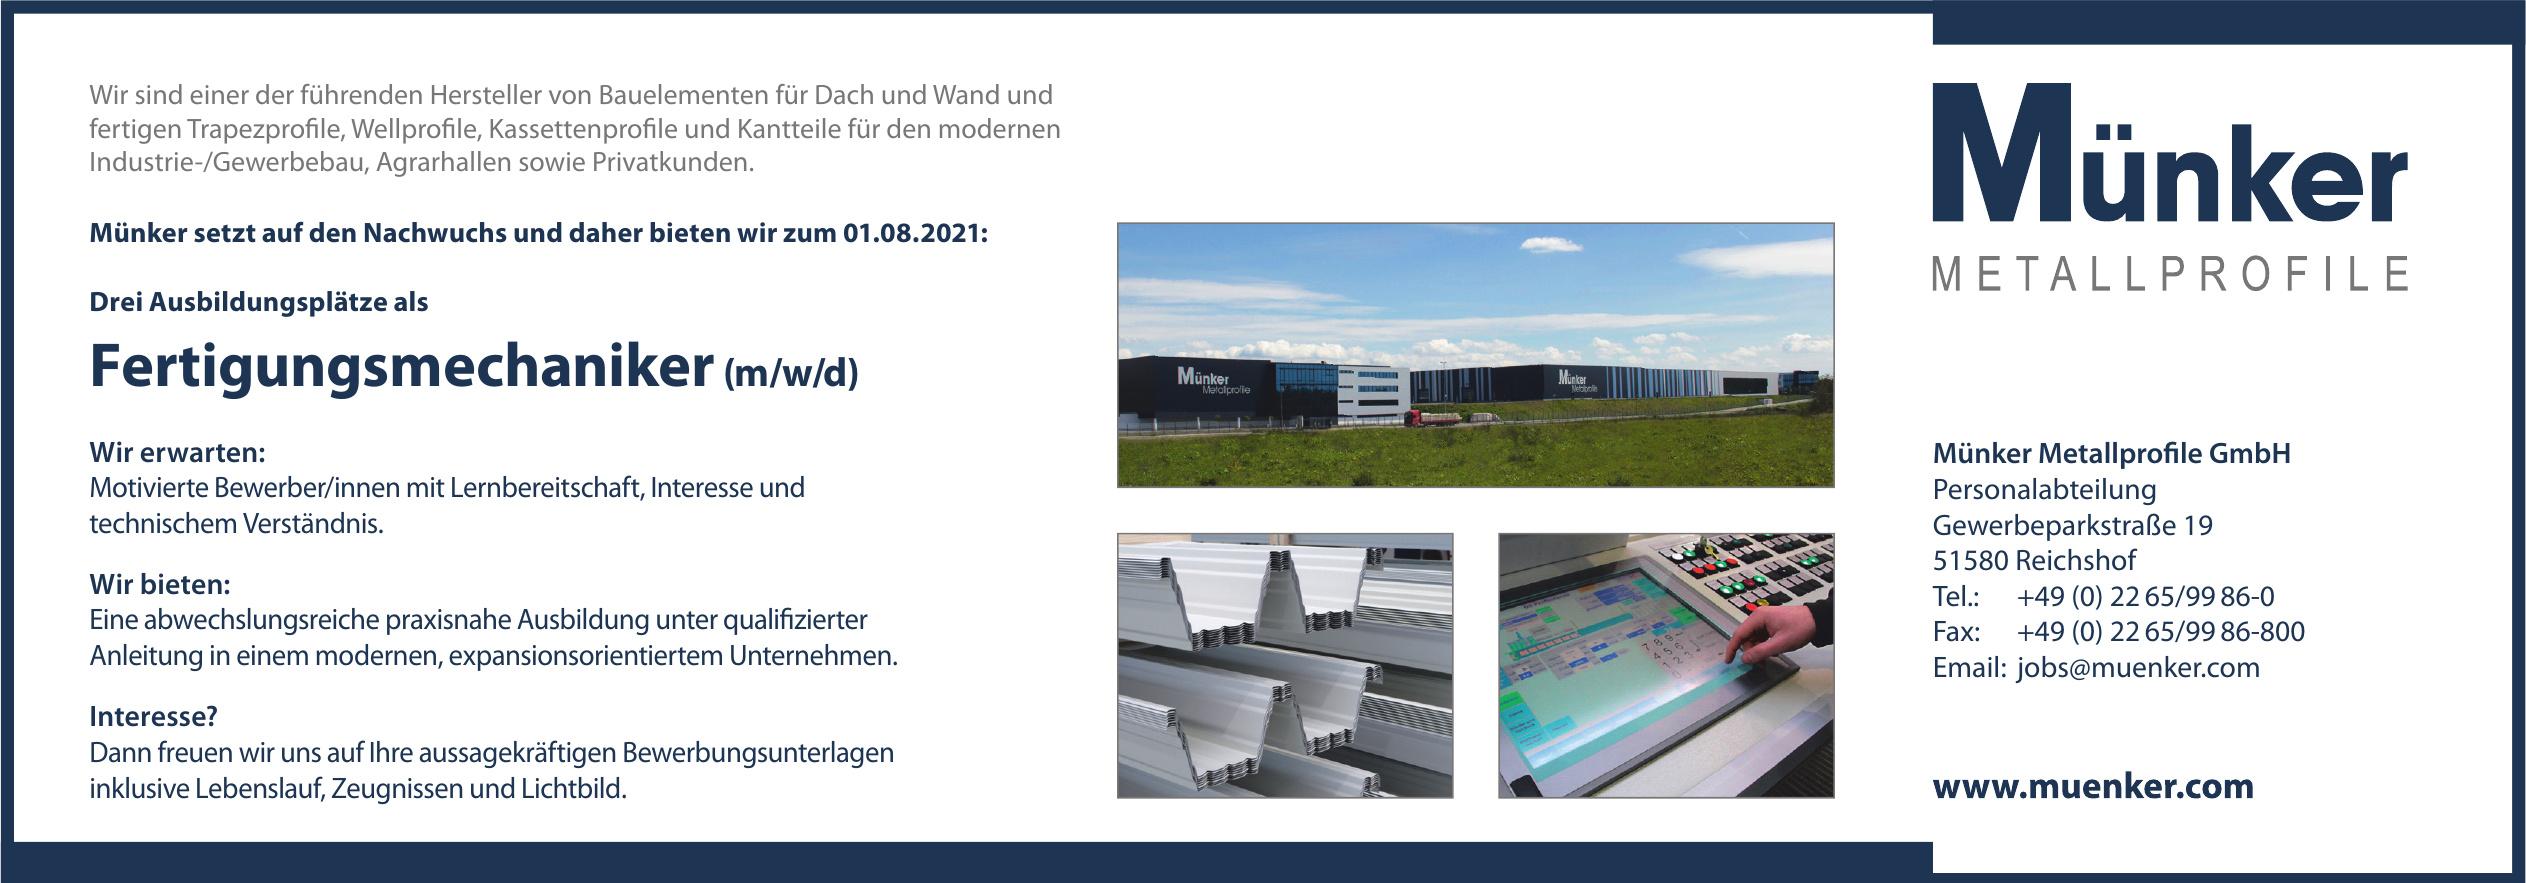 Münker Metallprofile GmbH